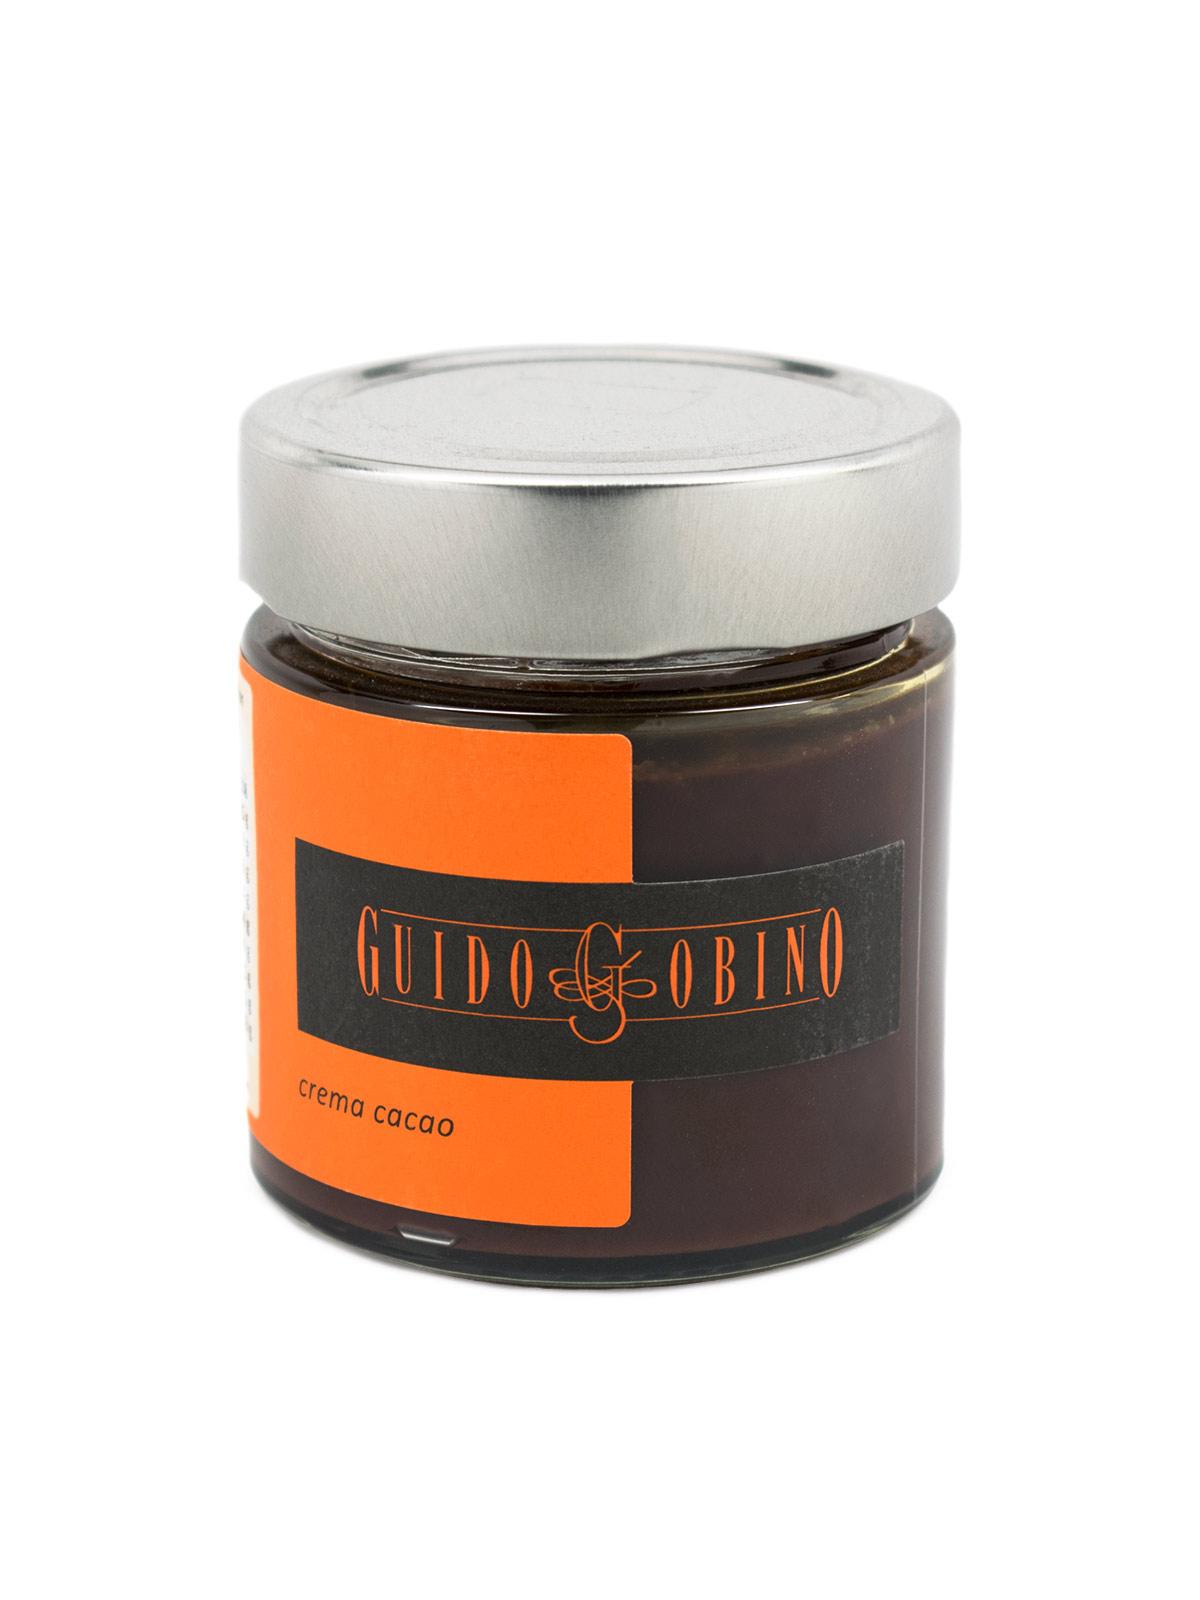 Crema Spalmabile al Cacao - Sweets, Treats, & Snacks - Buon'Italia